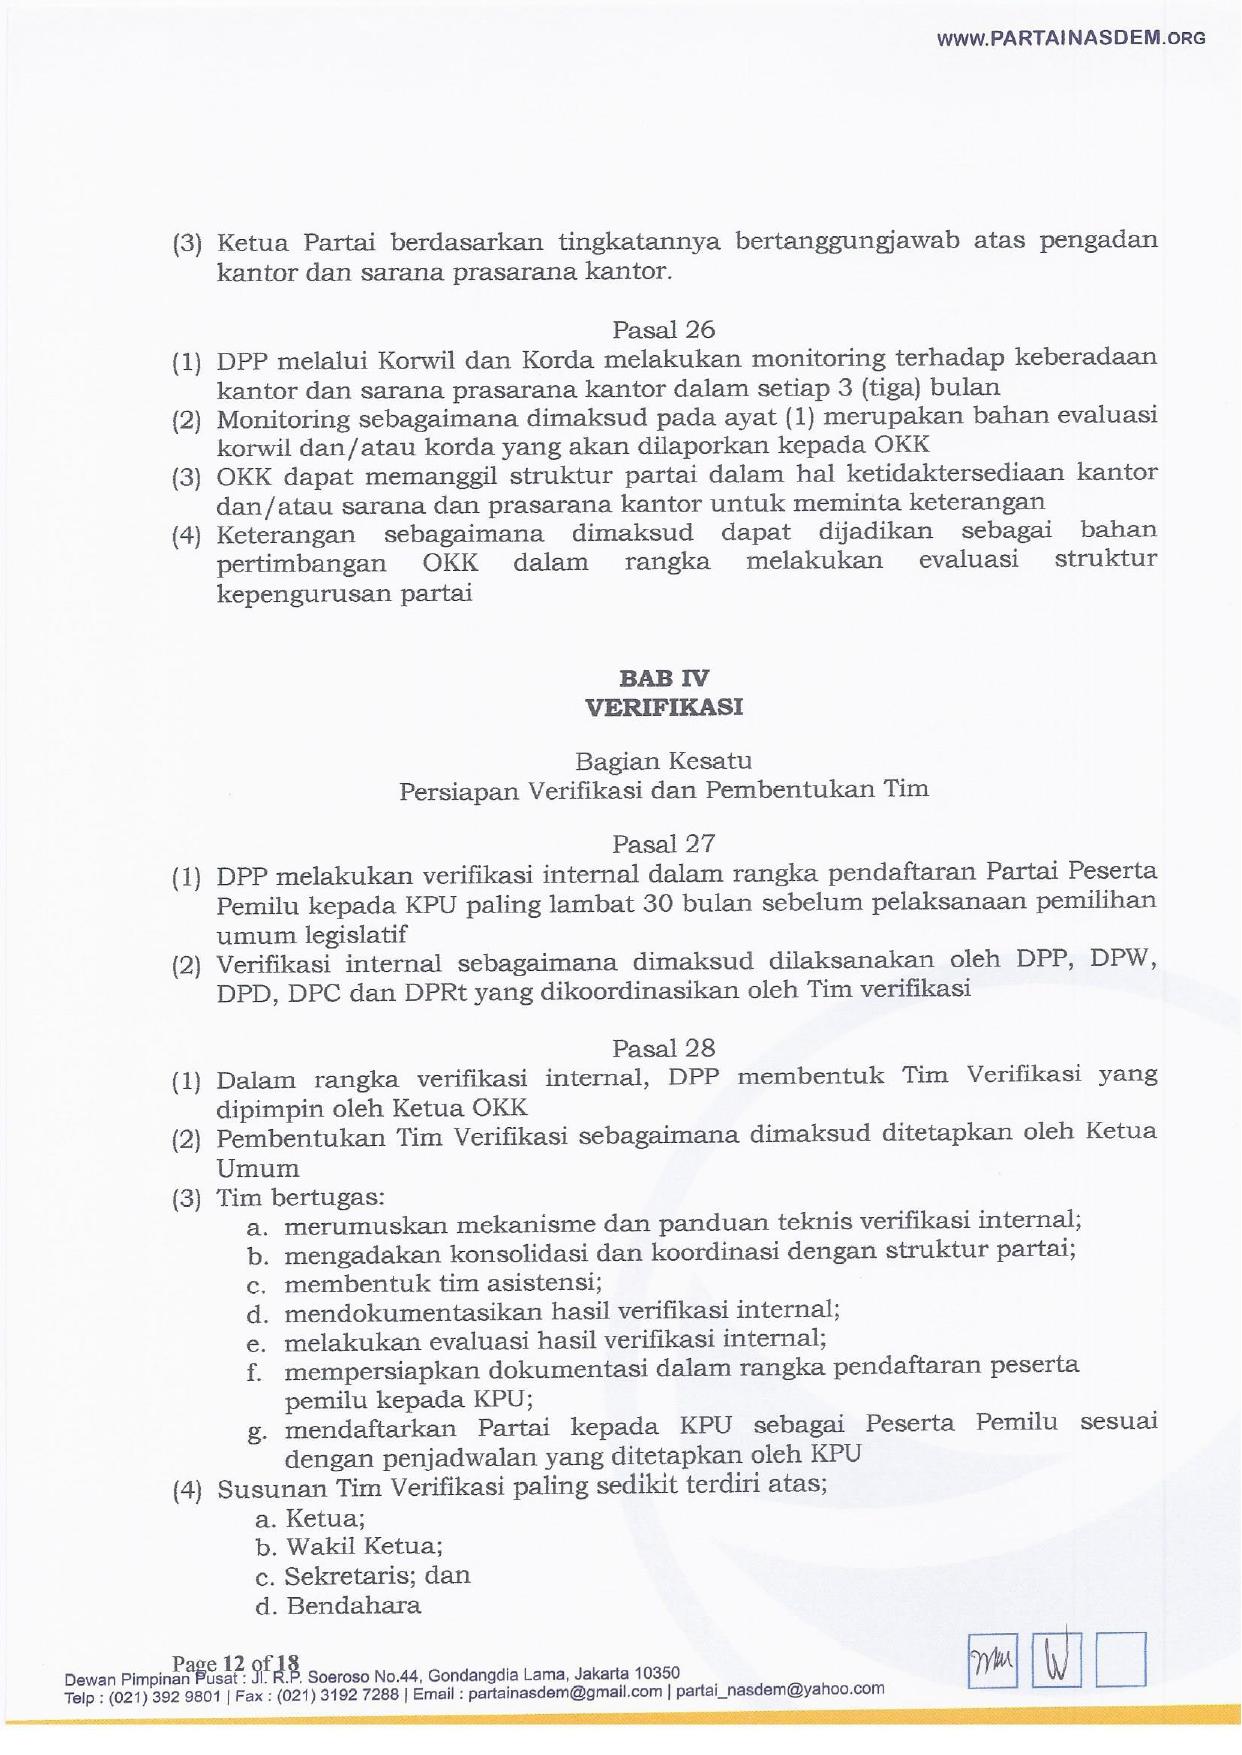 2016_PO no 01 PENGUATAN STRUKTUR DAN PERSIAPAN VERIFIKASI_page-0012